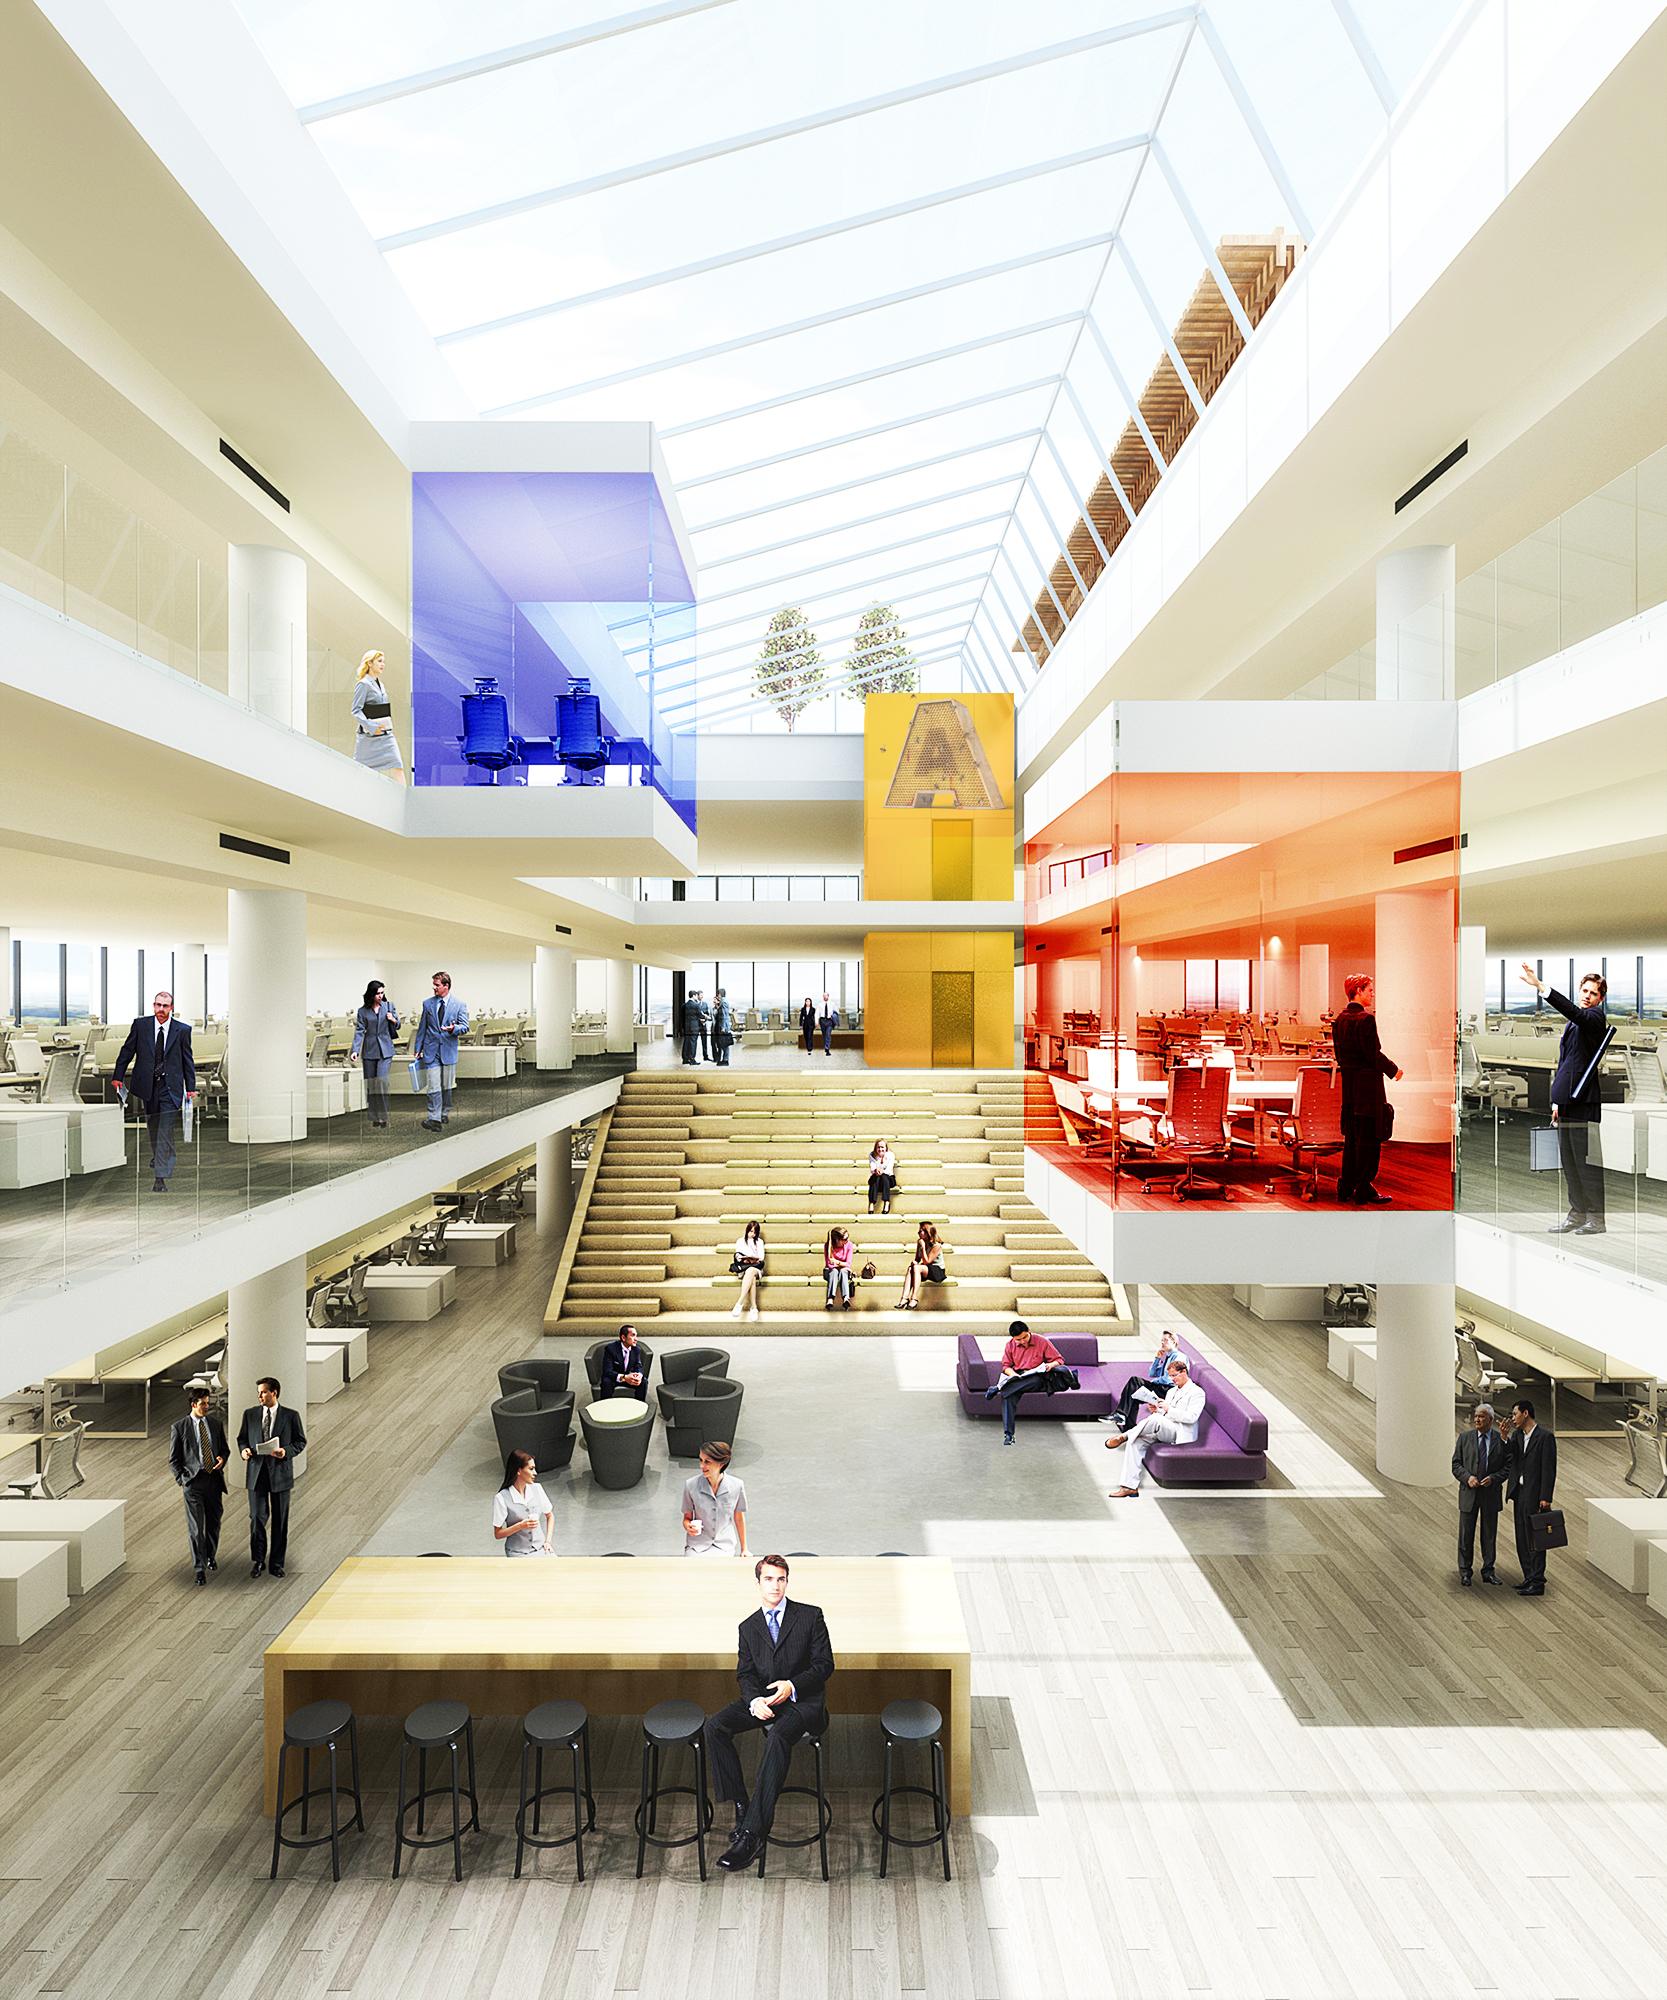 Atrium with floating conf. rooms